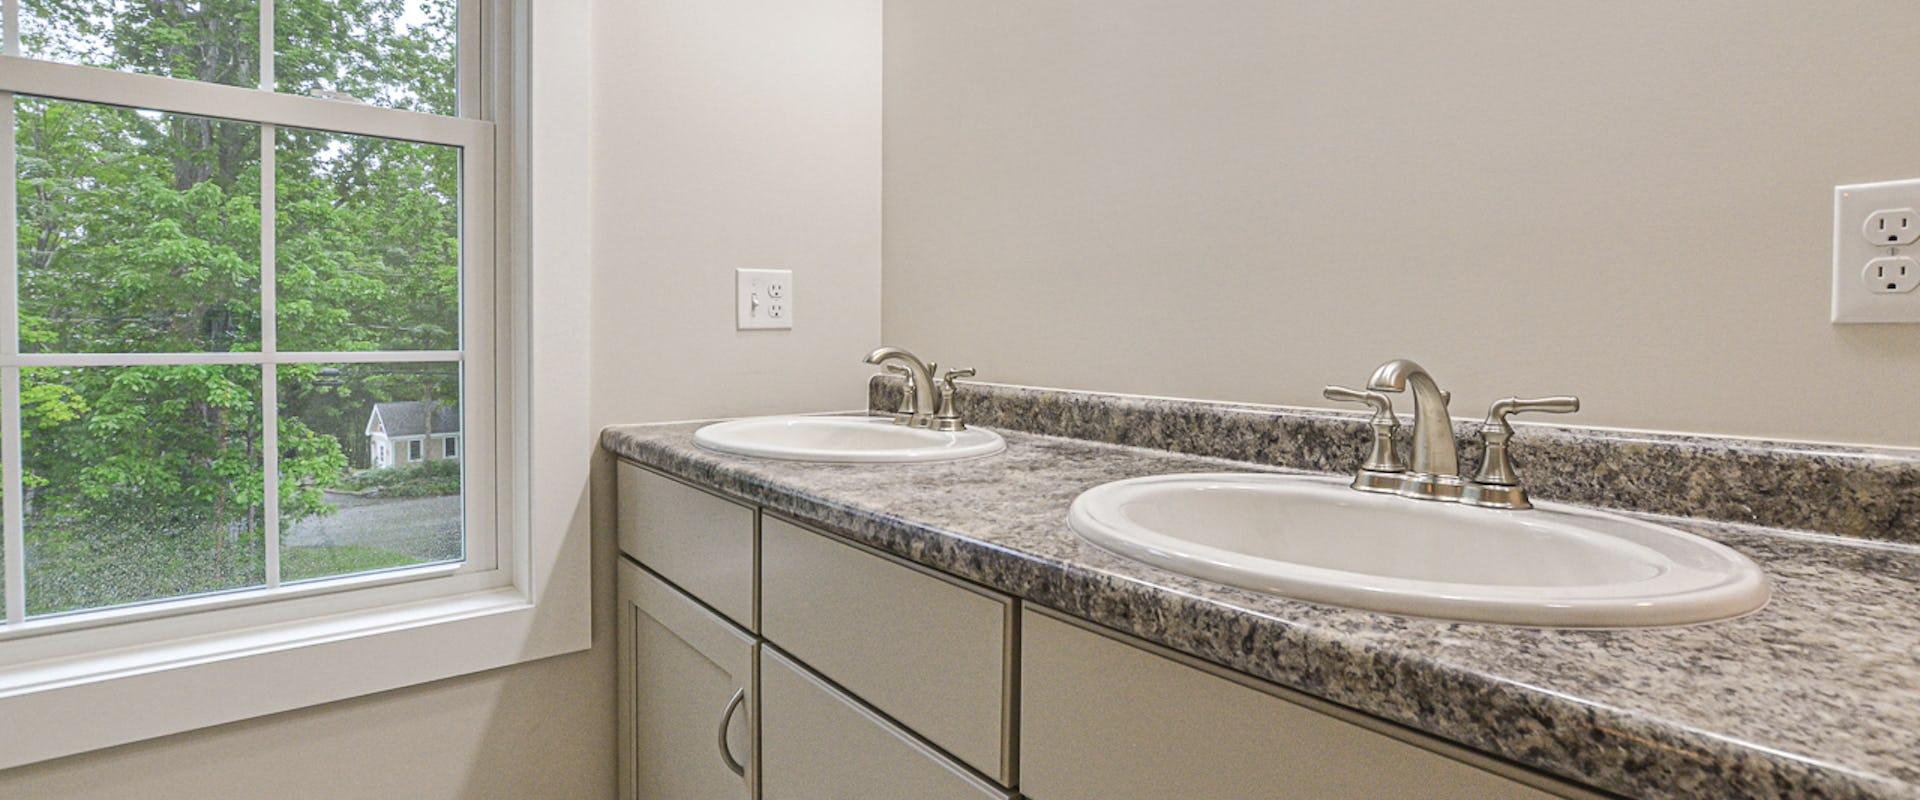 double sinks in new bathroom